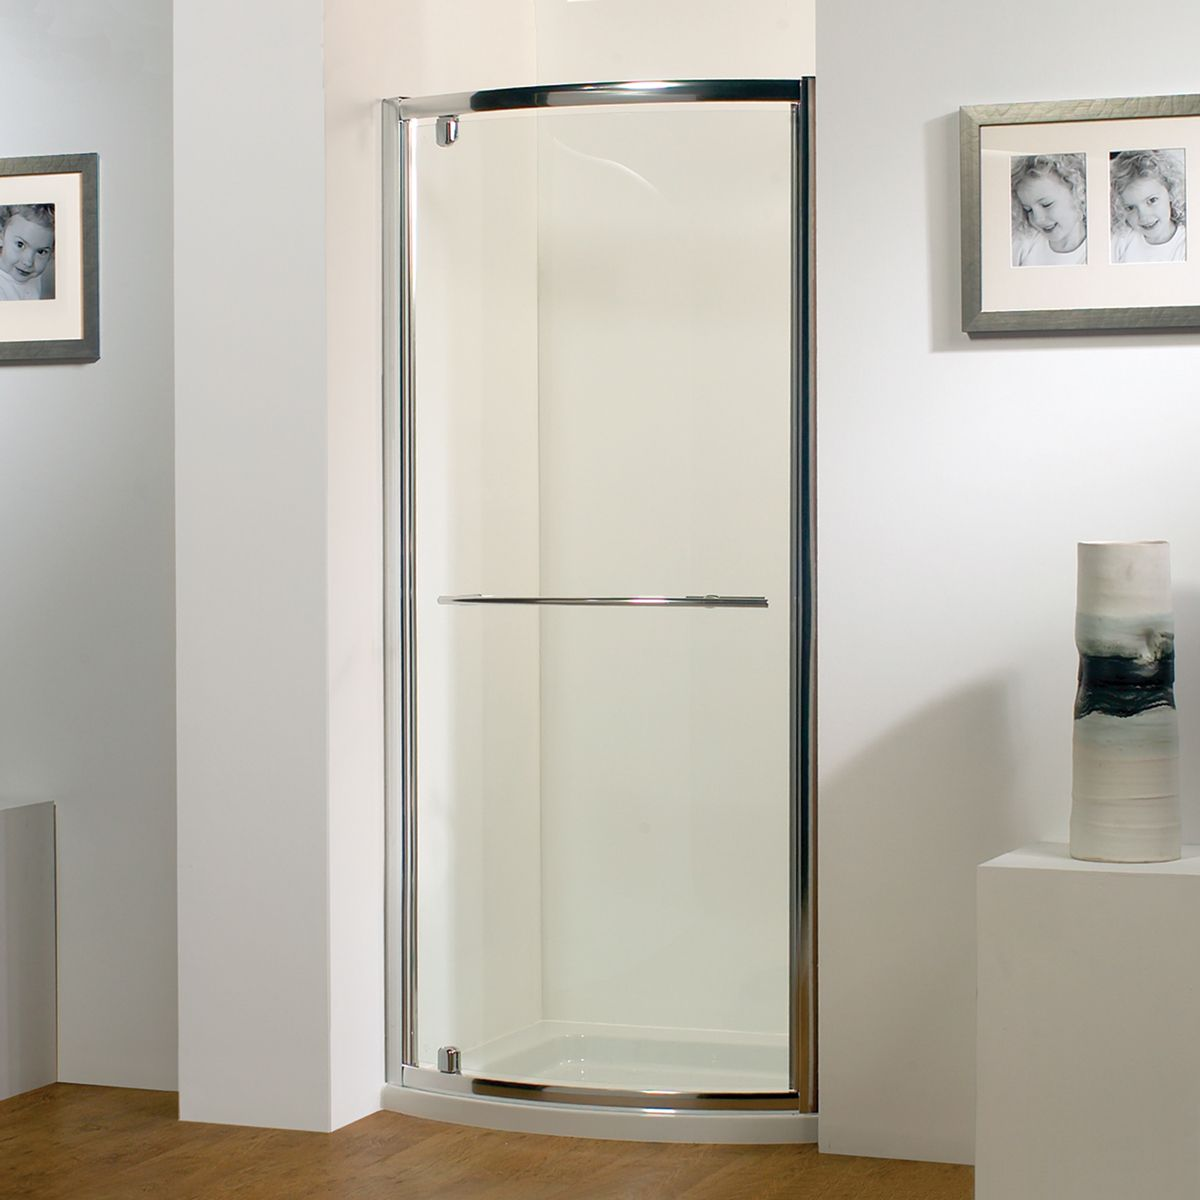 Kudos Original Bowed Pivot Shower Door 900mm With Concept 2 Shower Tray